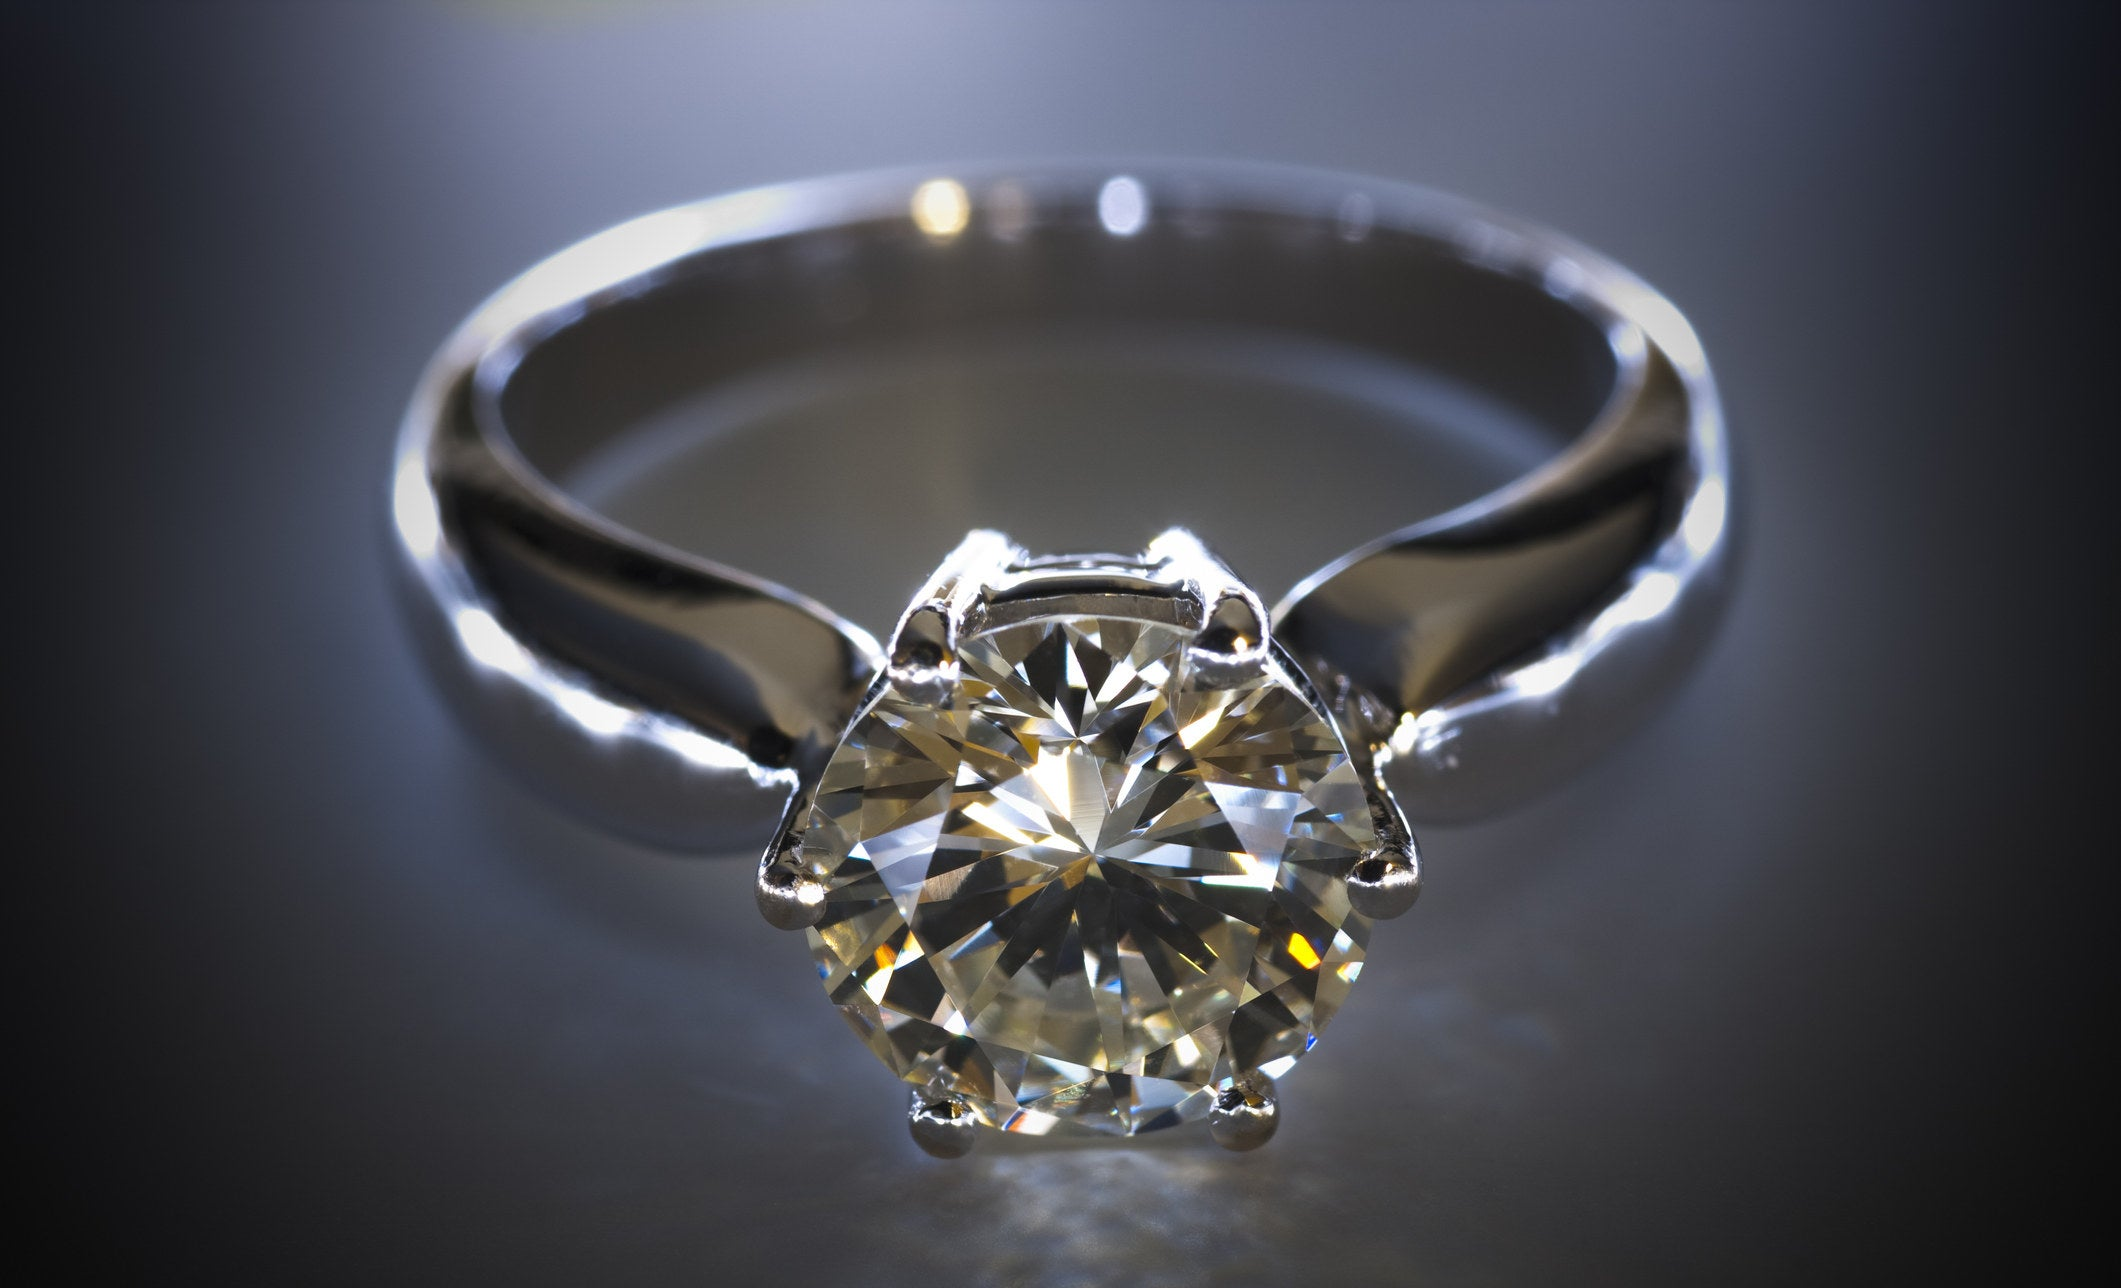 Diamond ring on black table top